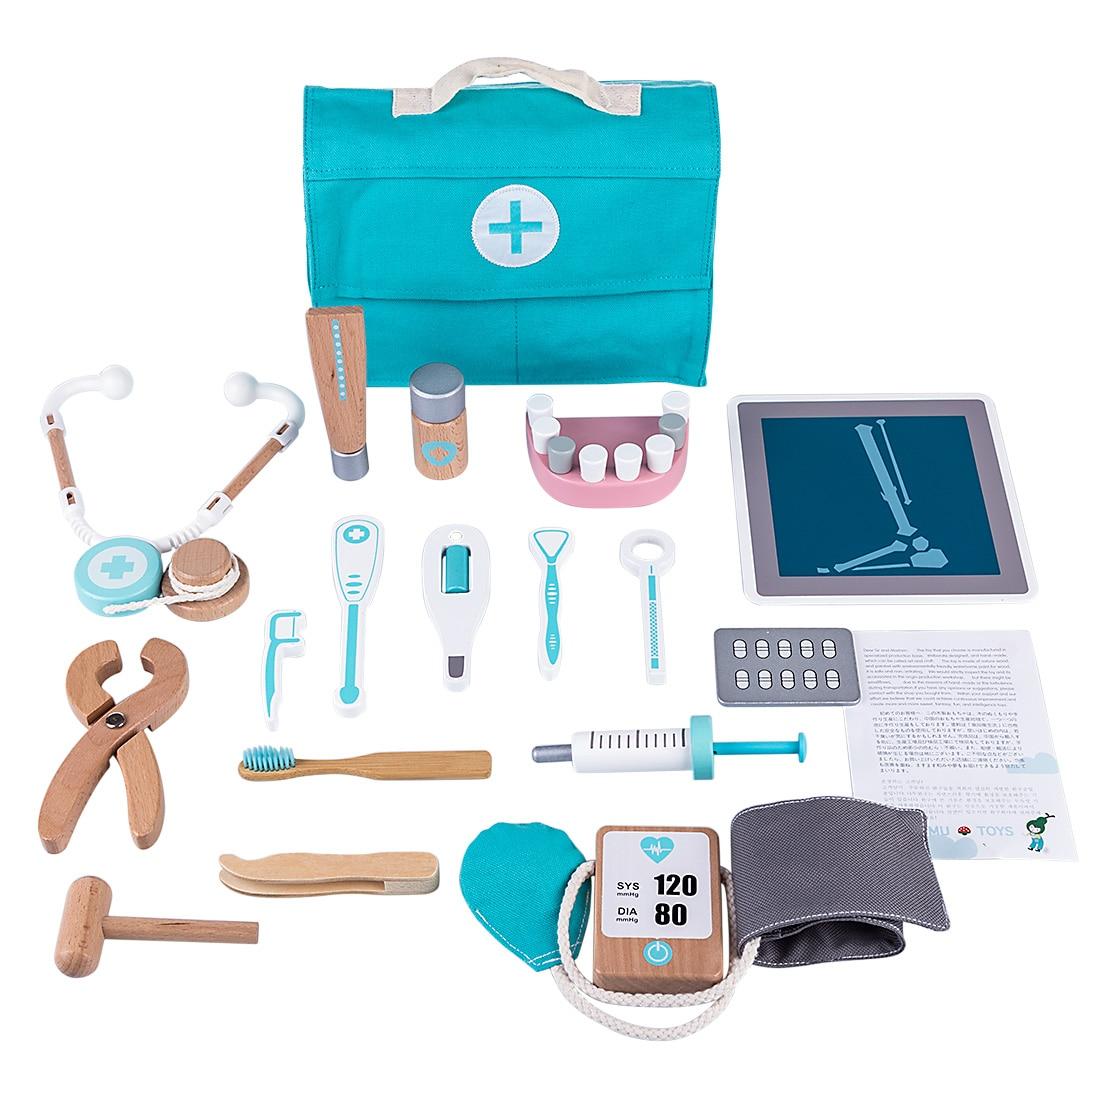 NFSTRIKE 18Pcs Children Wooden Pretend Dentist Toolbox Doctor Medical Playset With Stethoscope Kids Birthdaty Gifts 2020